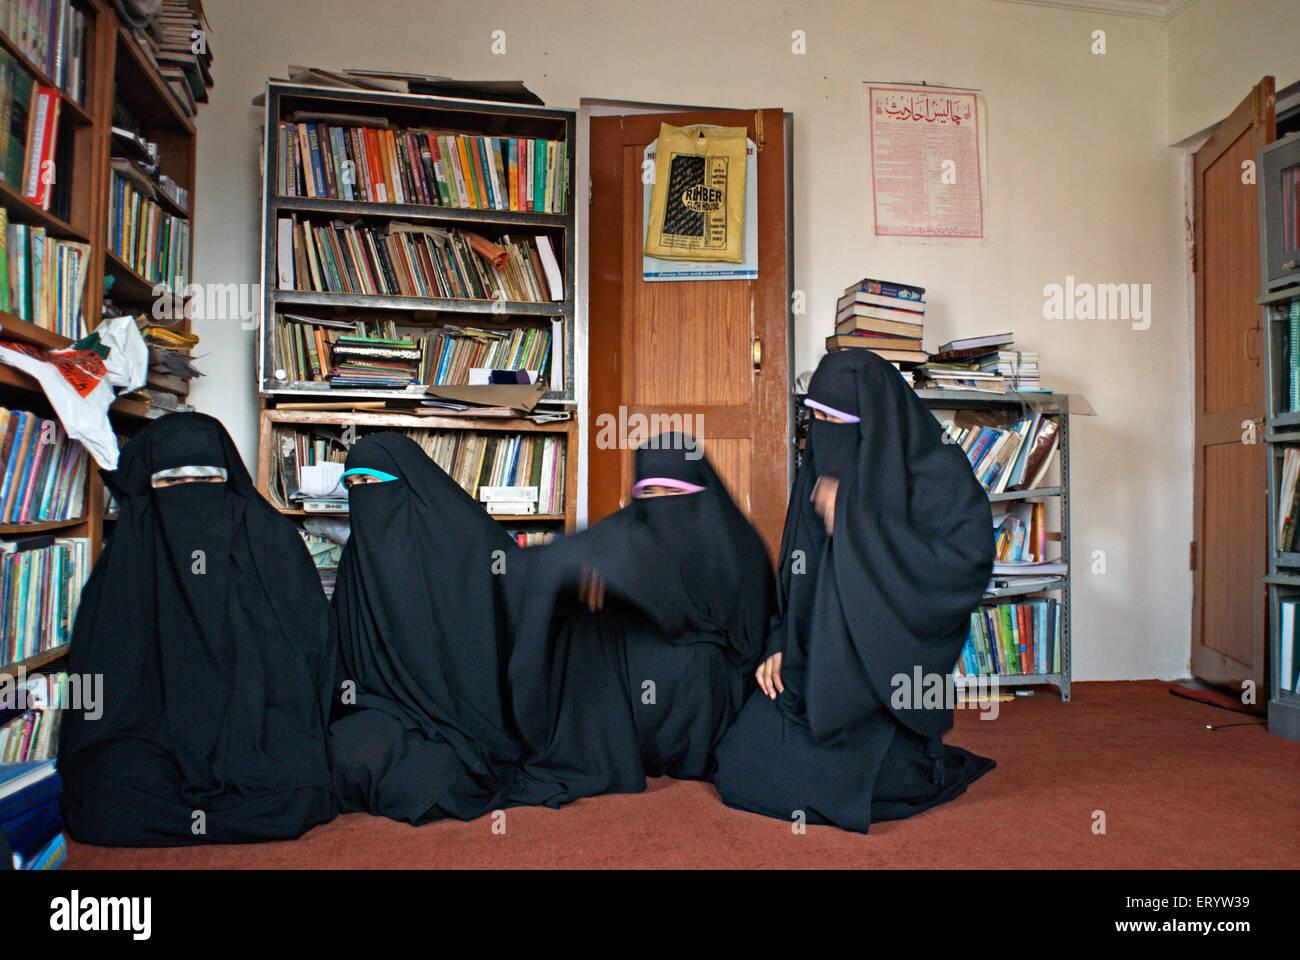 Islamic extremist organisation of women Dukhtaran E Millat  ; Srinagar ; Jammu and Kashmir ; India NOMR - Stock Image